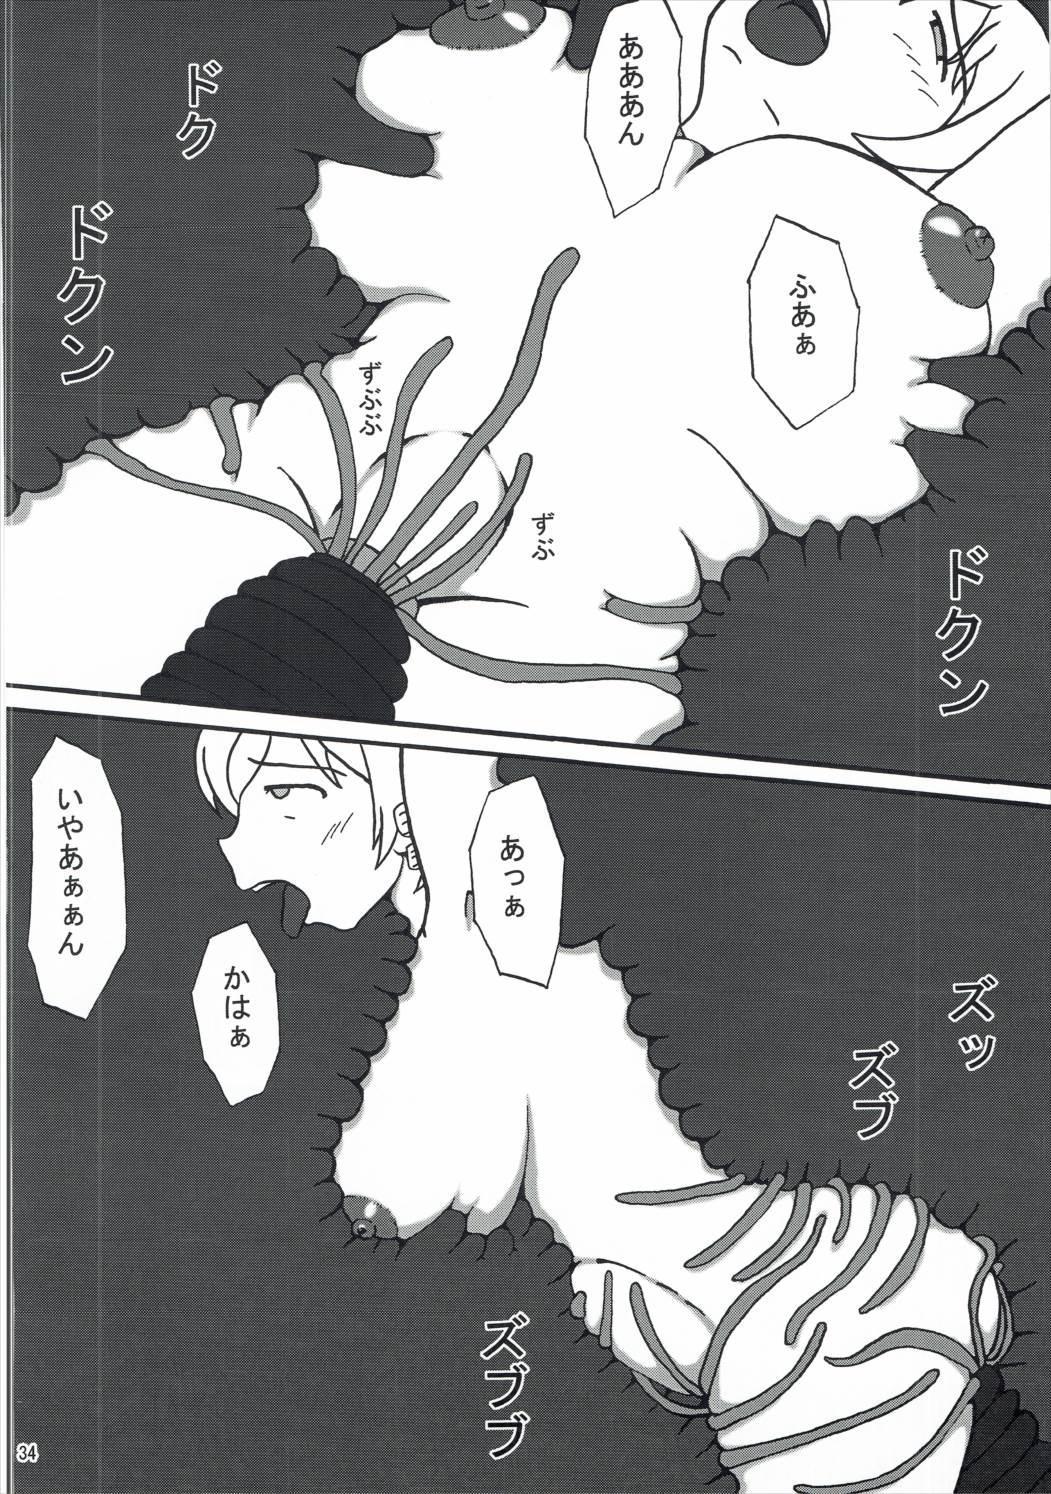 (C89) [KATAMARI-YA (Kanetsuki Masayoshi, Shinama) Noushuku! ! Homumilk (Puella Magi Madoka Magica) 32